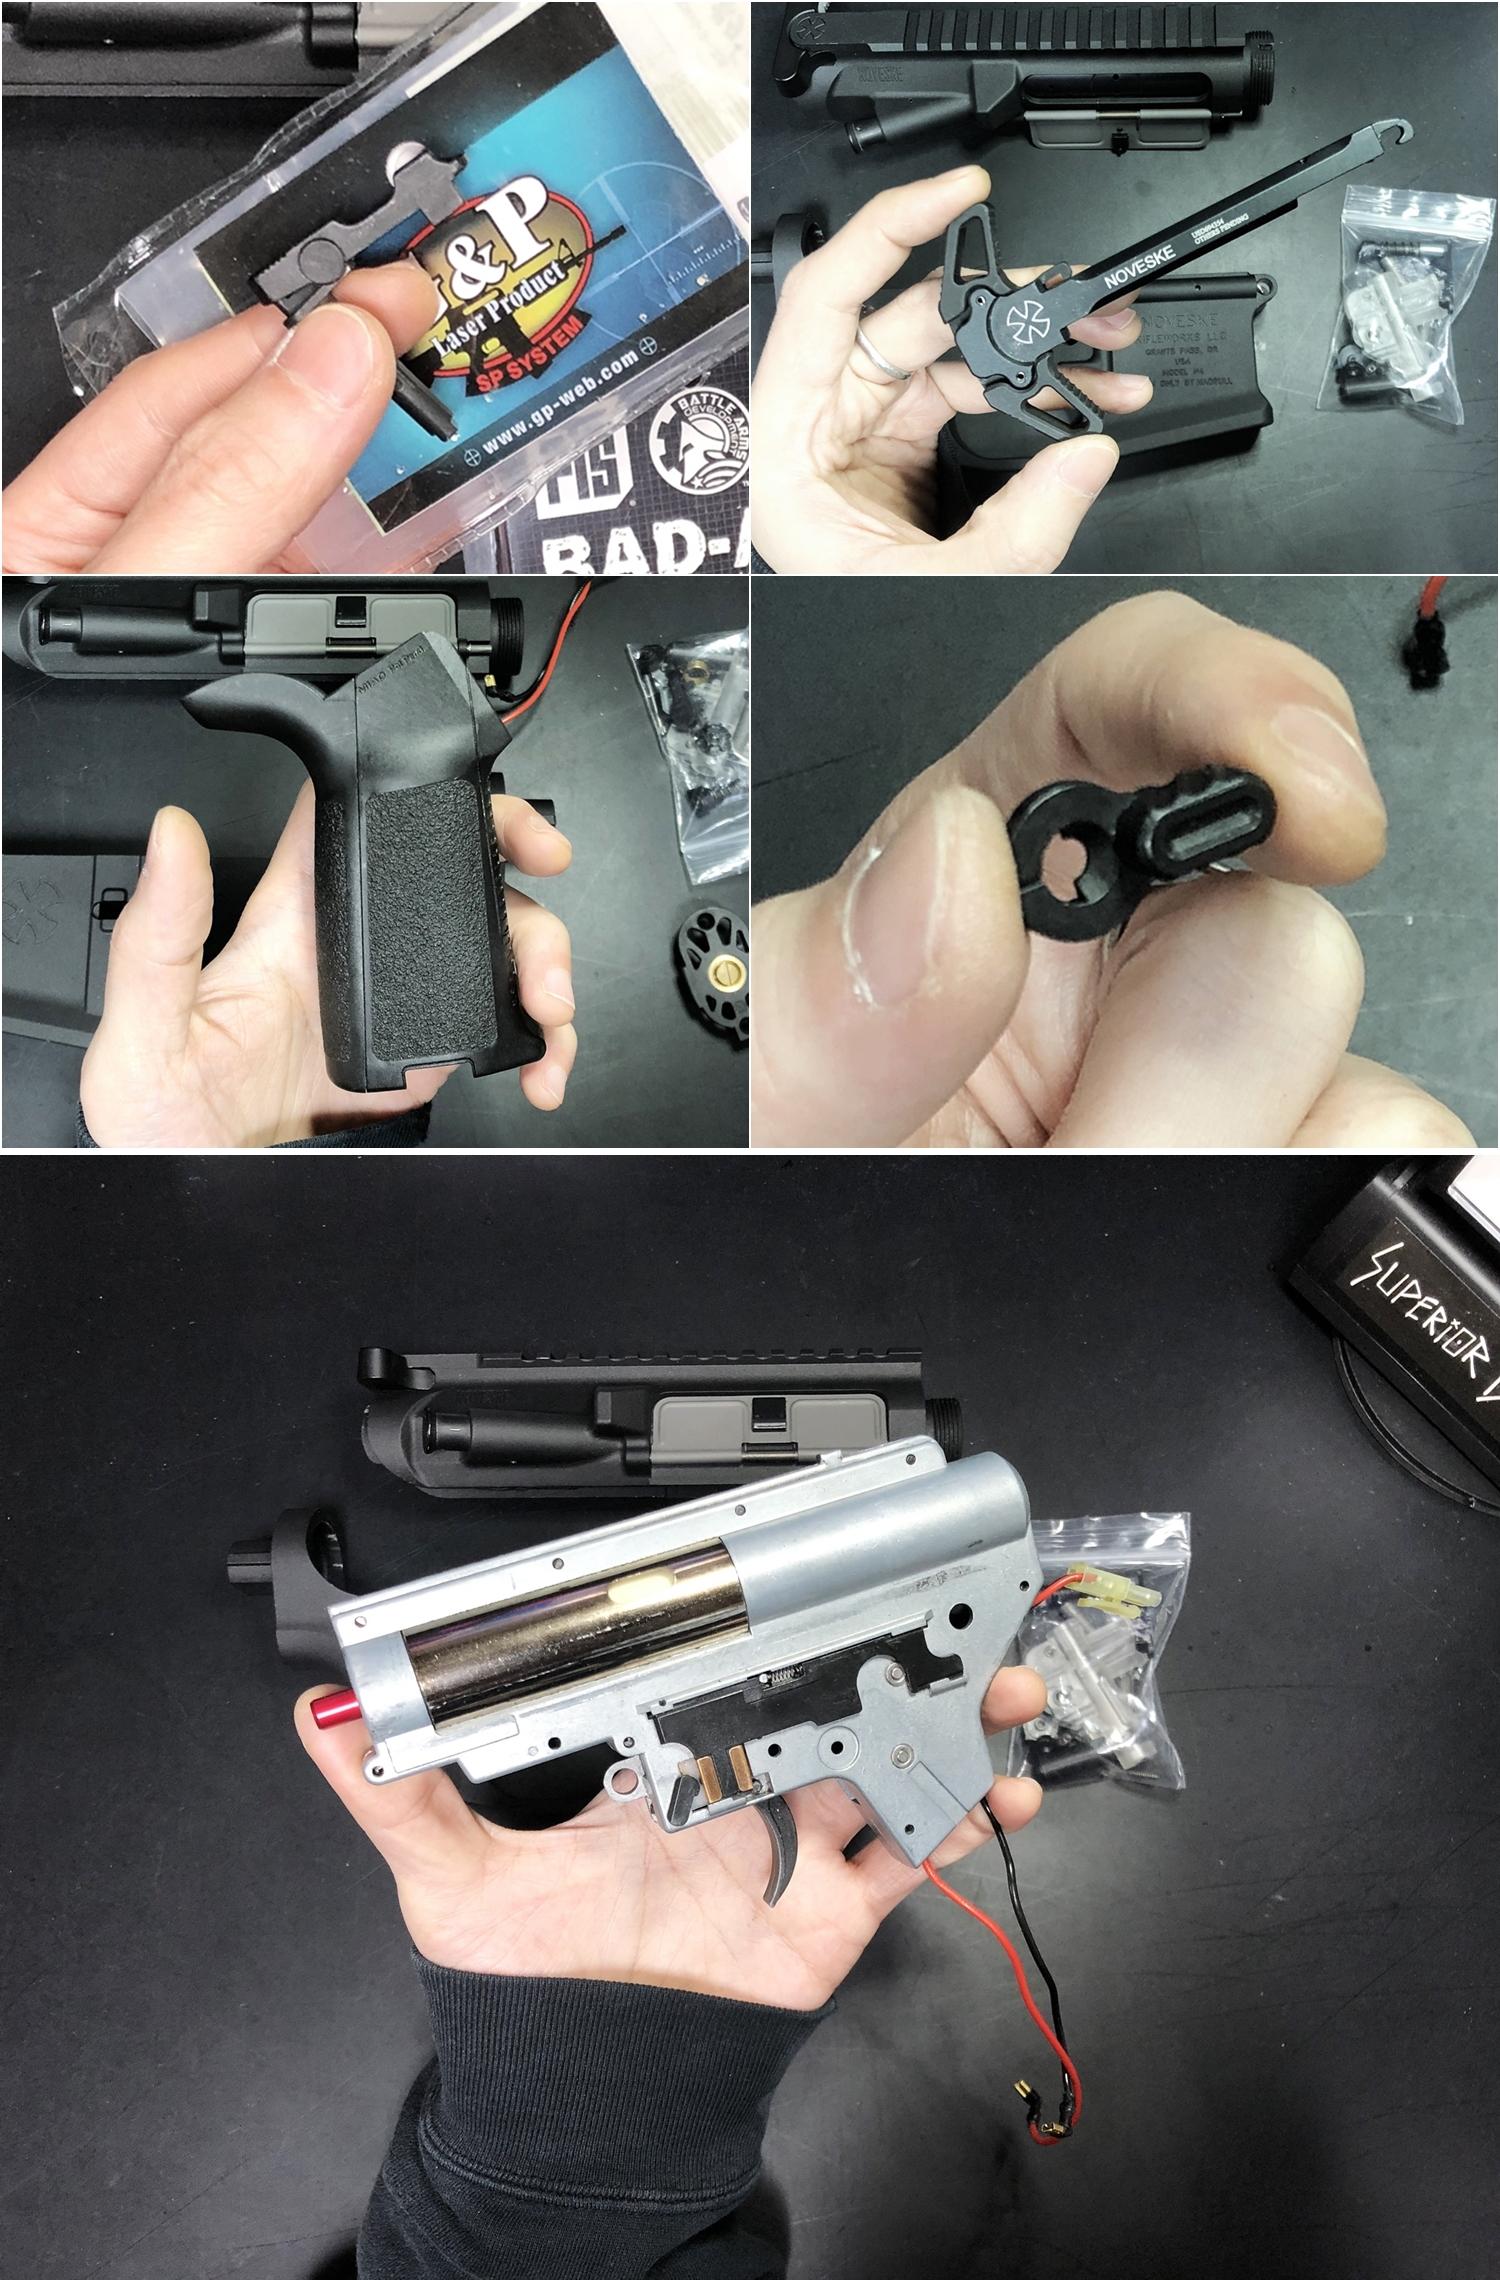 4 NOVESKE GEN3 N4 BY MADBULL!! 『第一弾』 新たにSTD民間系ARを作り始めたいと思います!! STD AR-15 M4 スタンダード 電動ガン マルイ ノベスケ ノベスキー マットブル メタルフレーム 動作テスト 組込 取付 カス